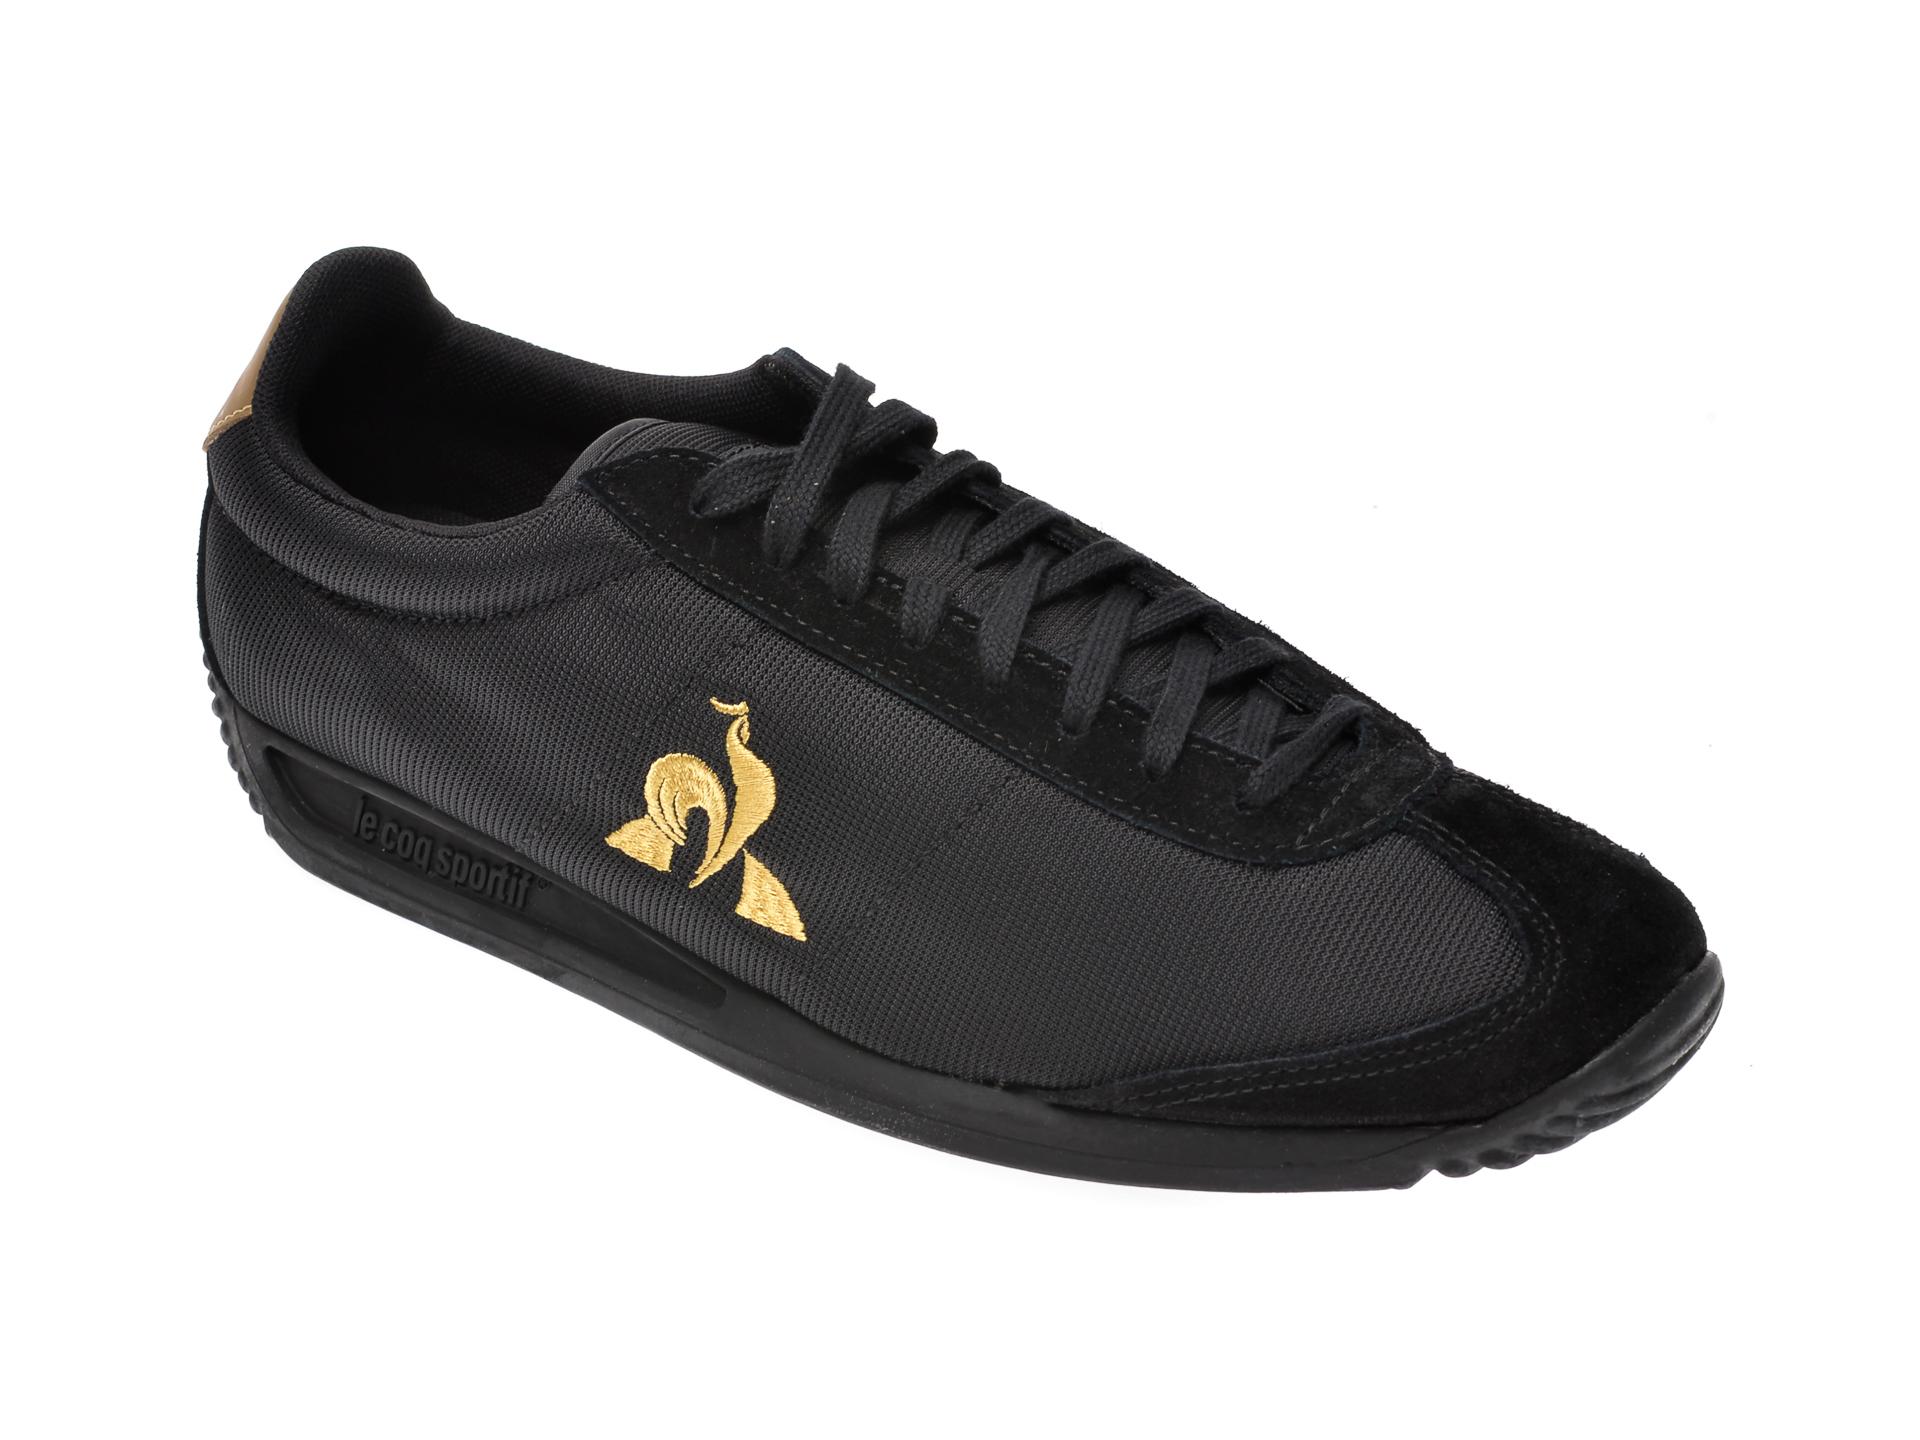 Pantofi sport LE COQ SPORTIF negri, 2010304, din material textil imagine